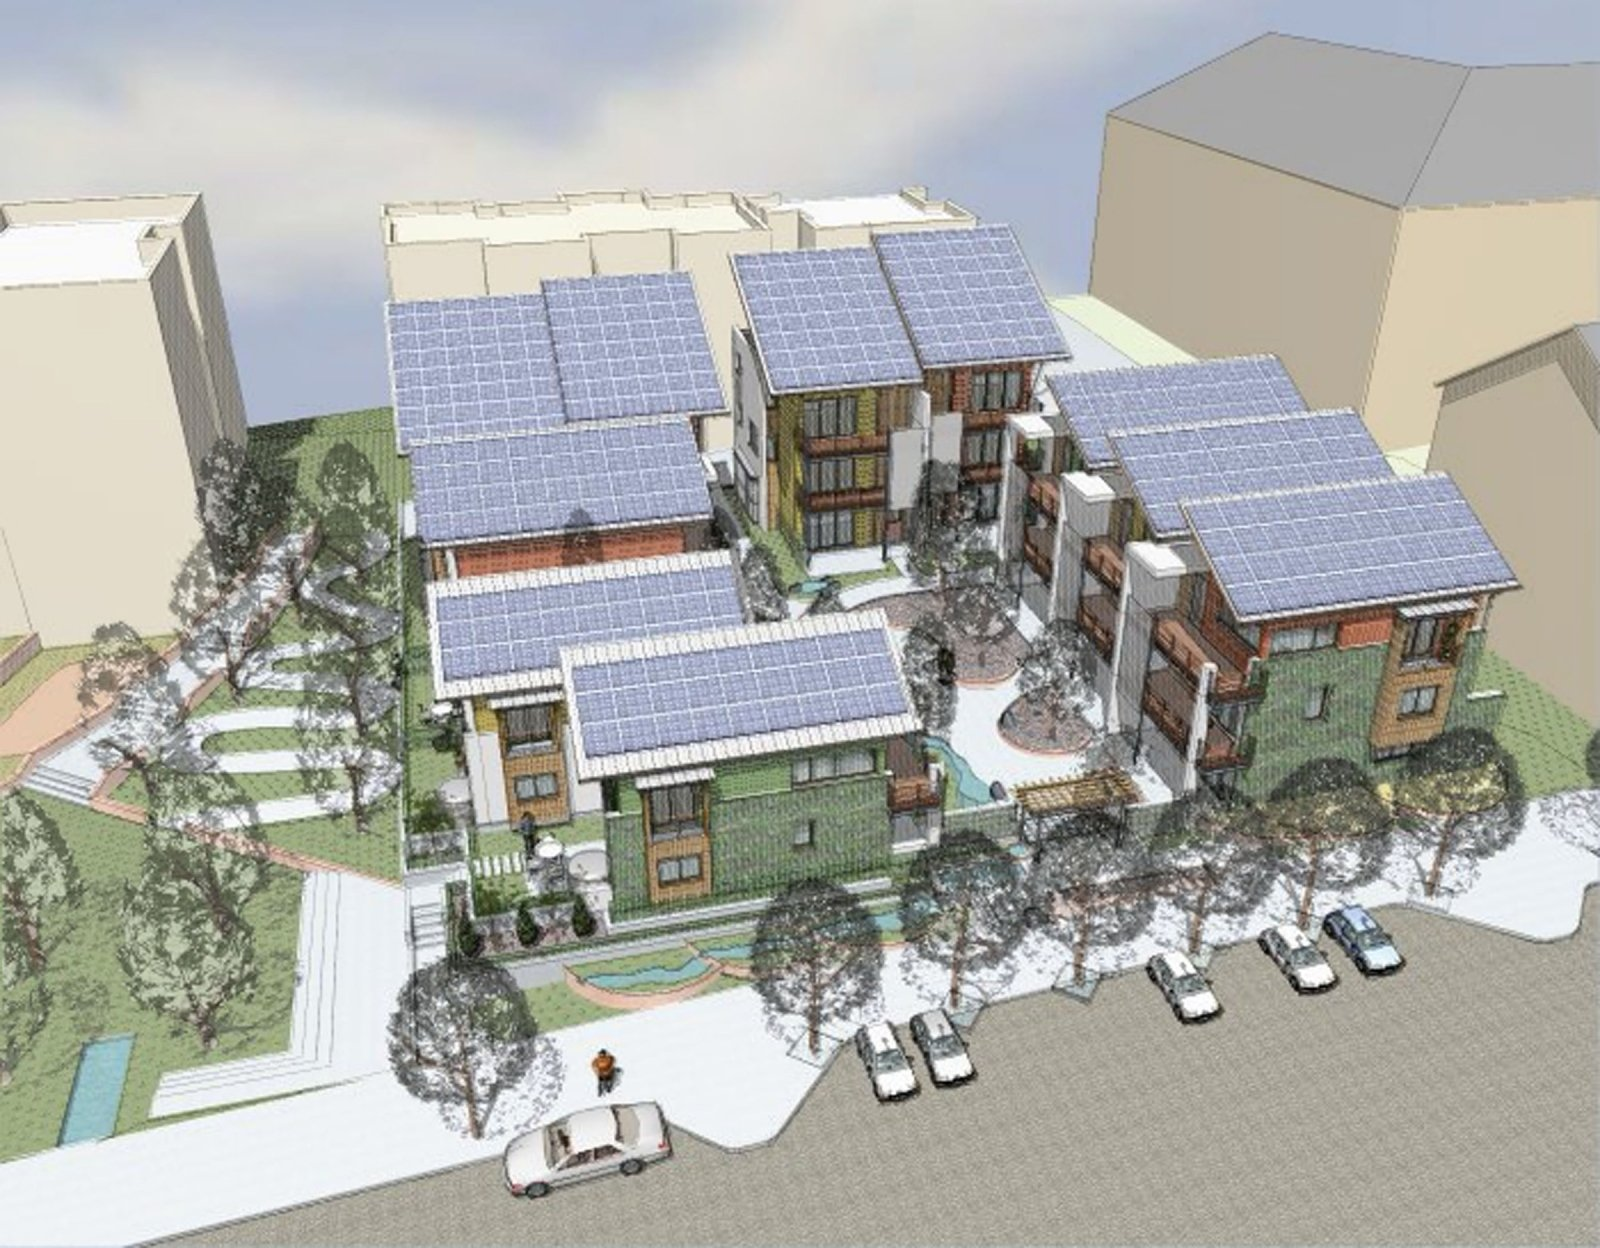 Photo 3 of 9 in A Zero-Energy Community: Part 3